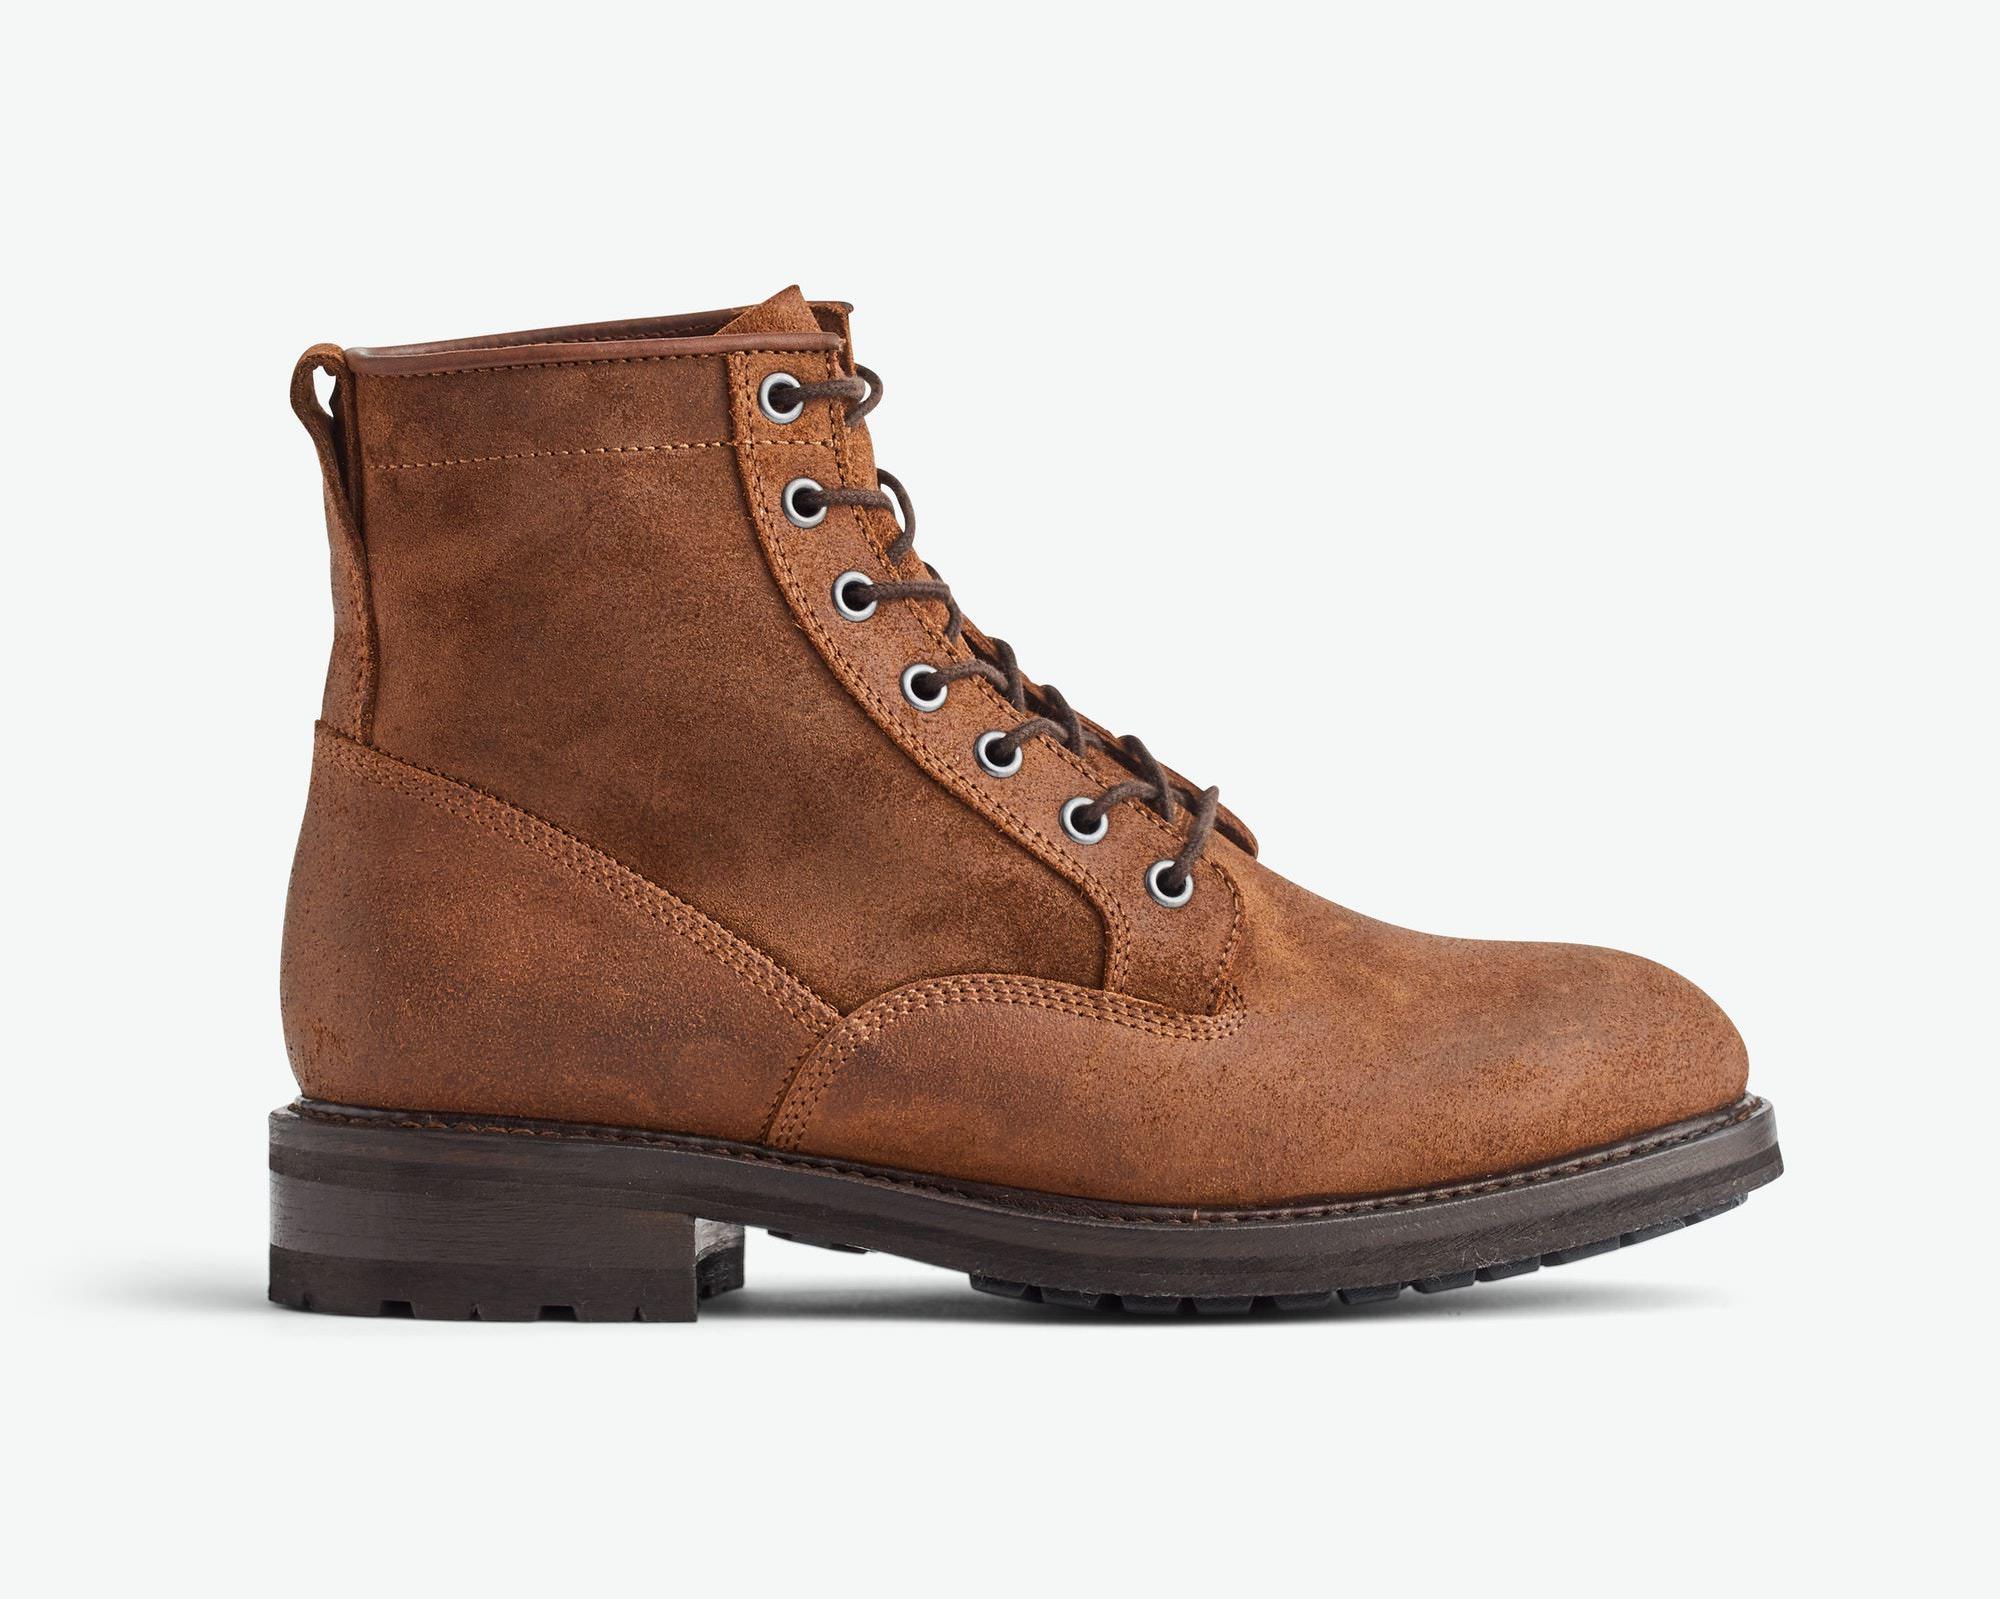 Filson Service Boots